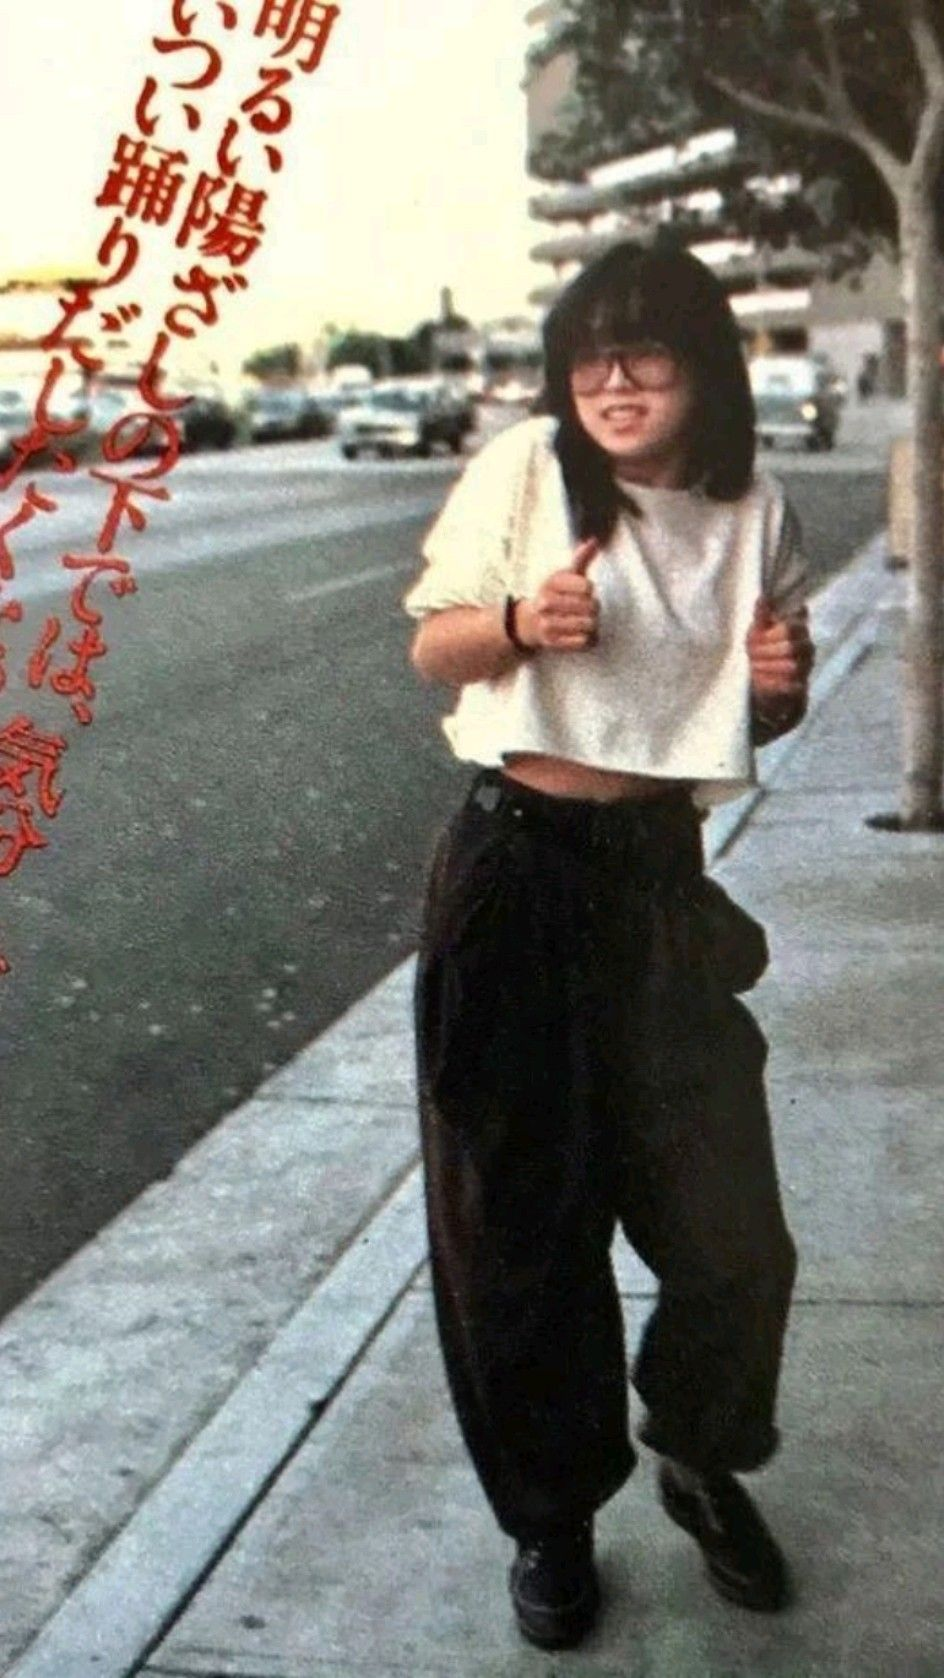 Japan 90s